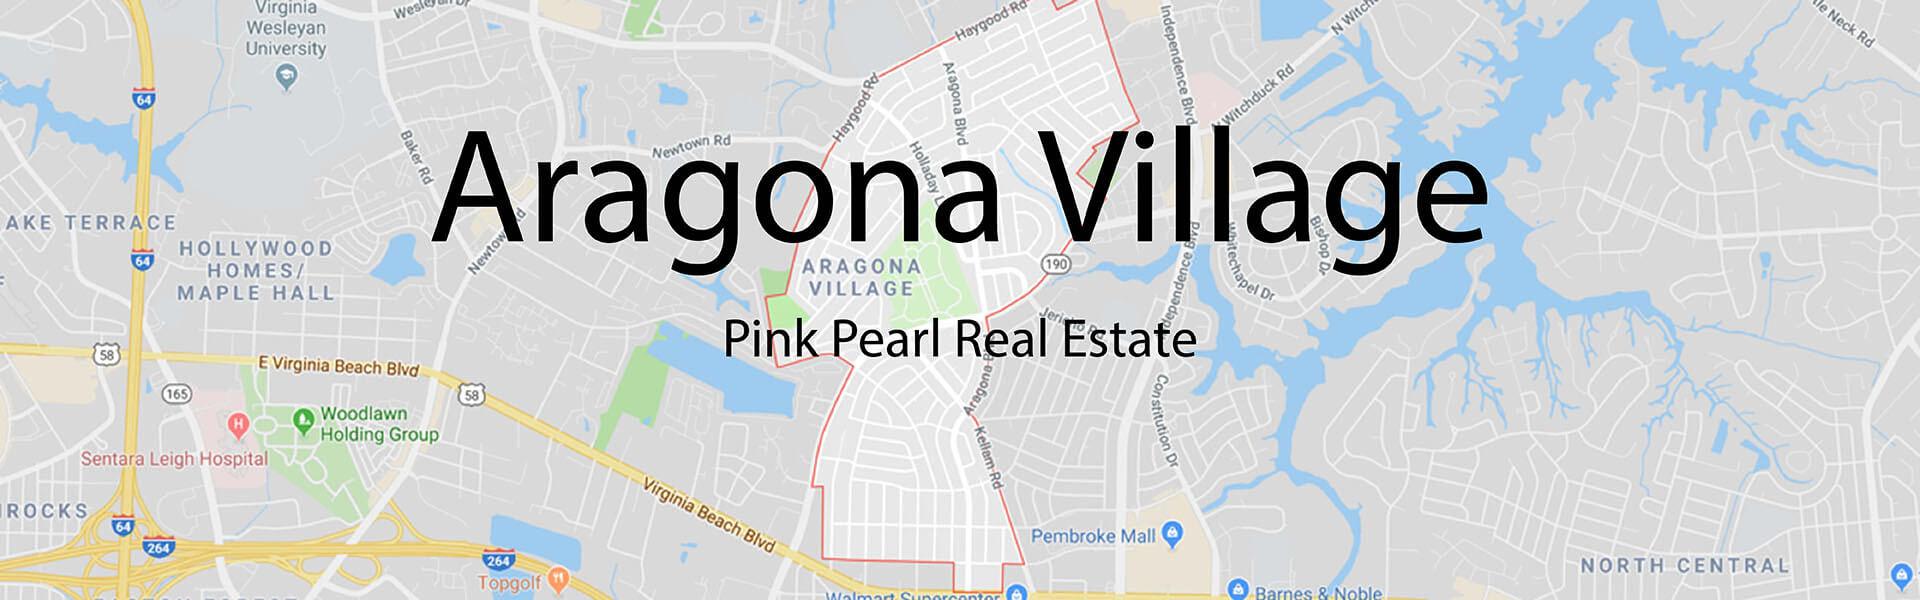 Aragona Village Real Estate in Virginia Beach VA 23462